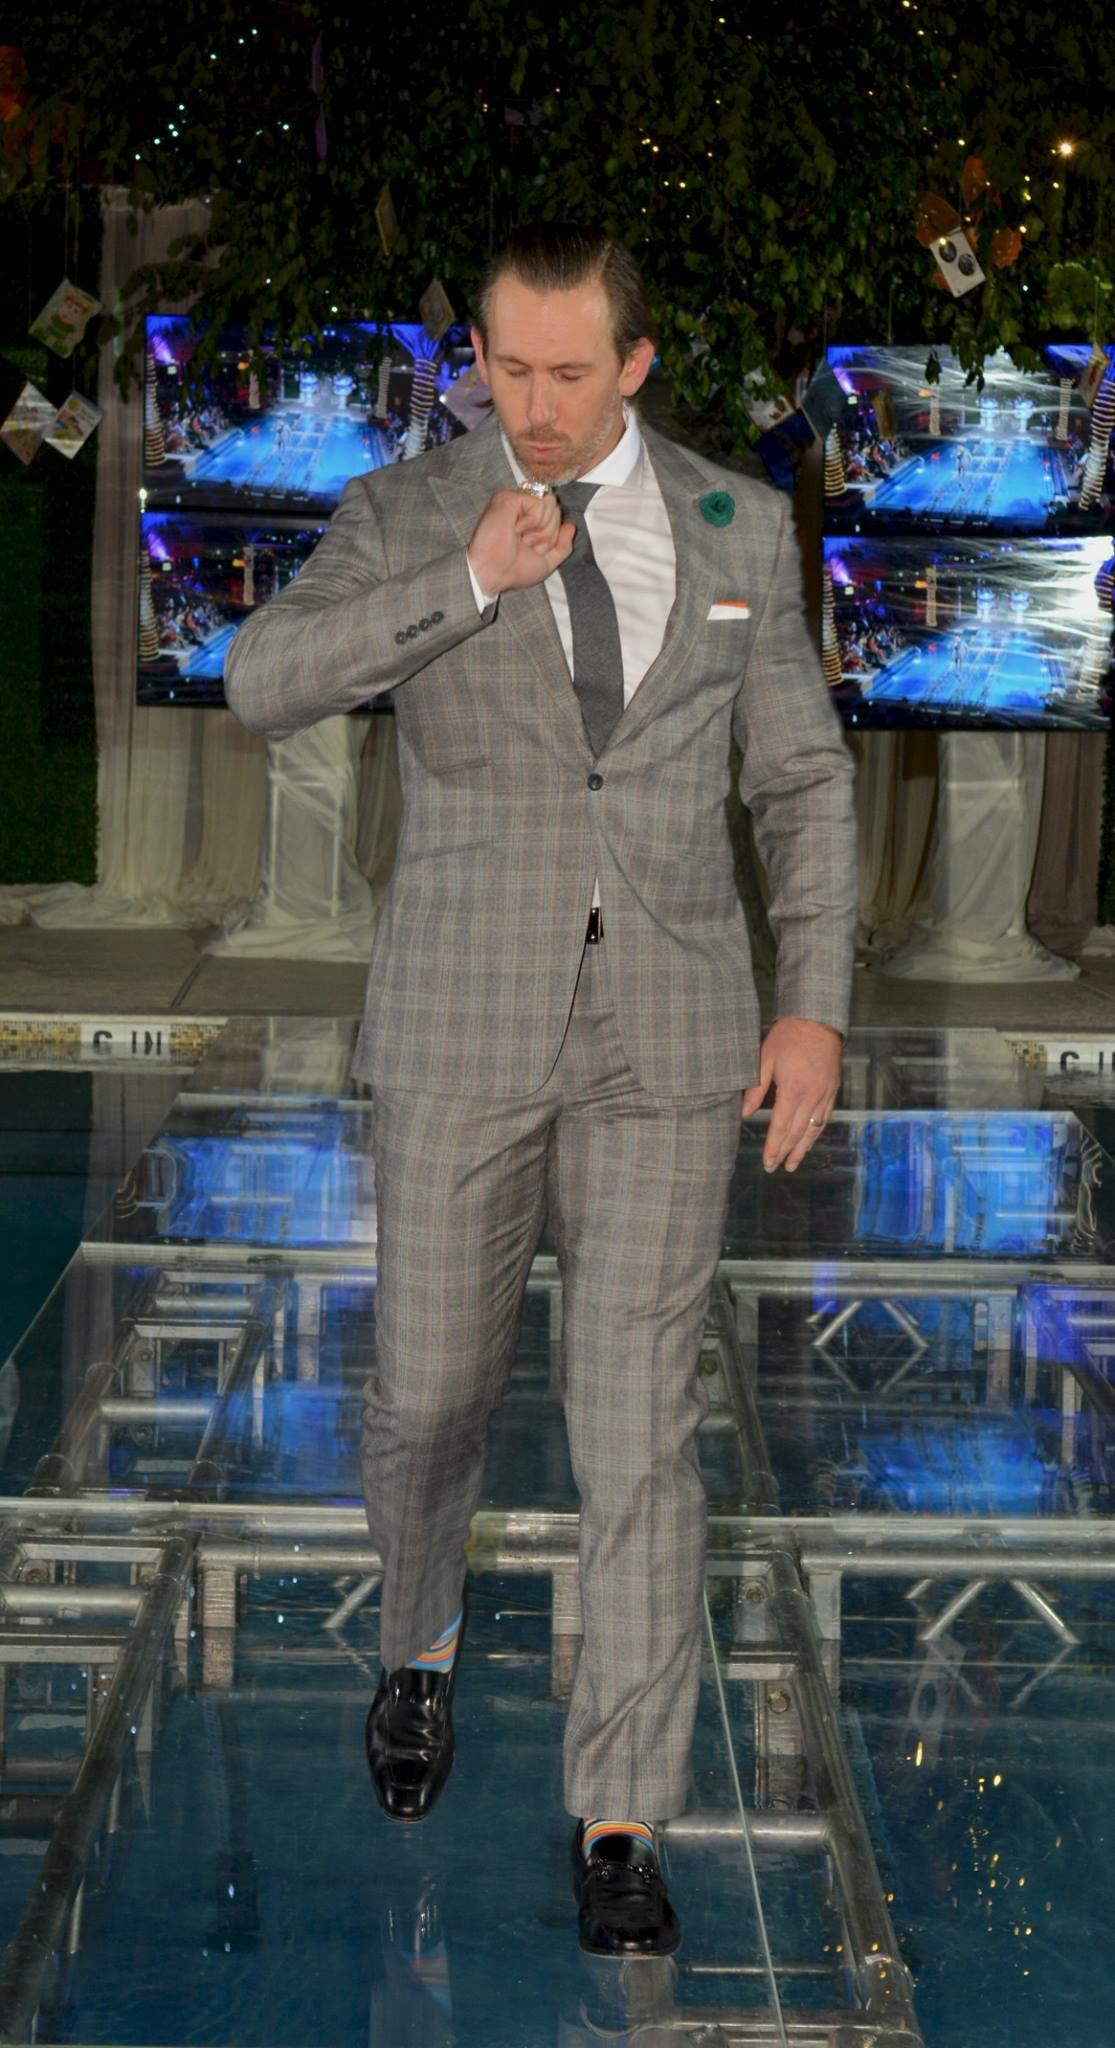 Super Bowl Champ Owen Daniels